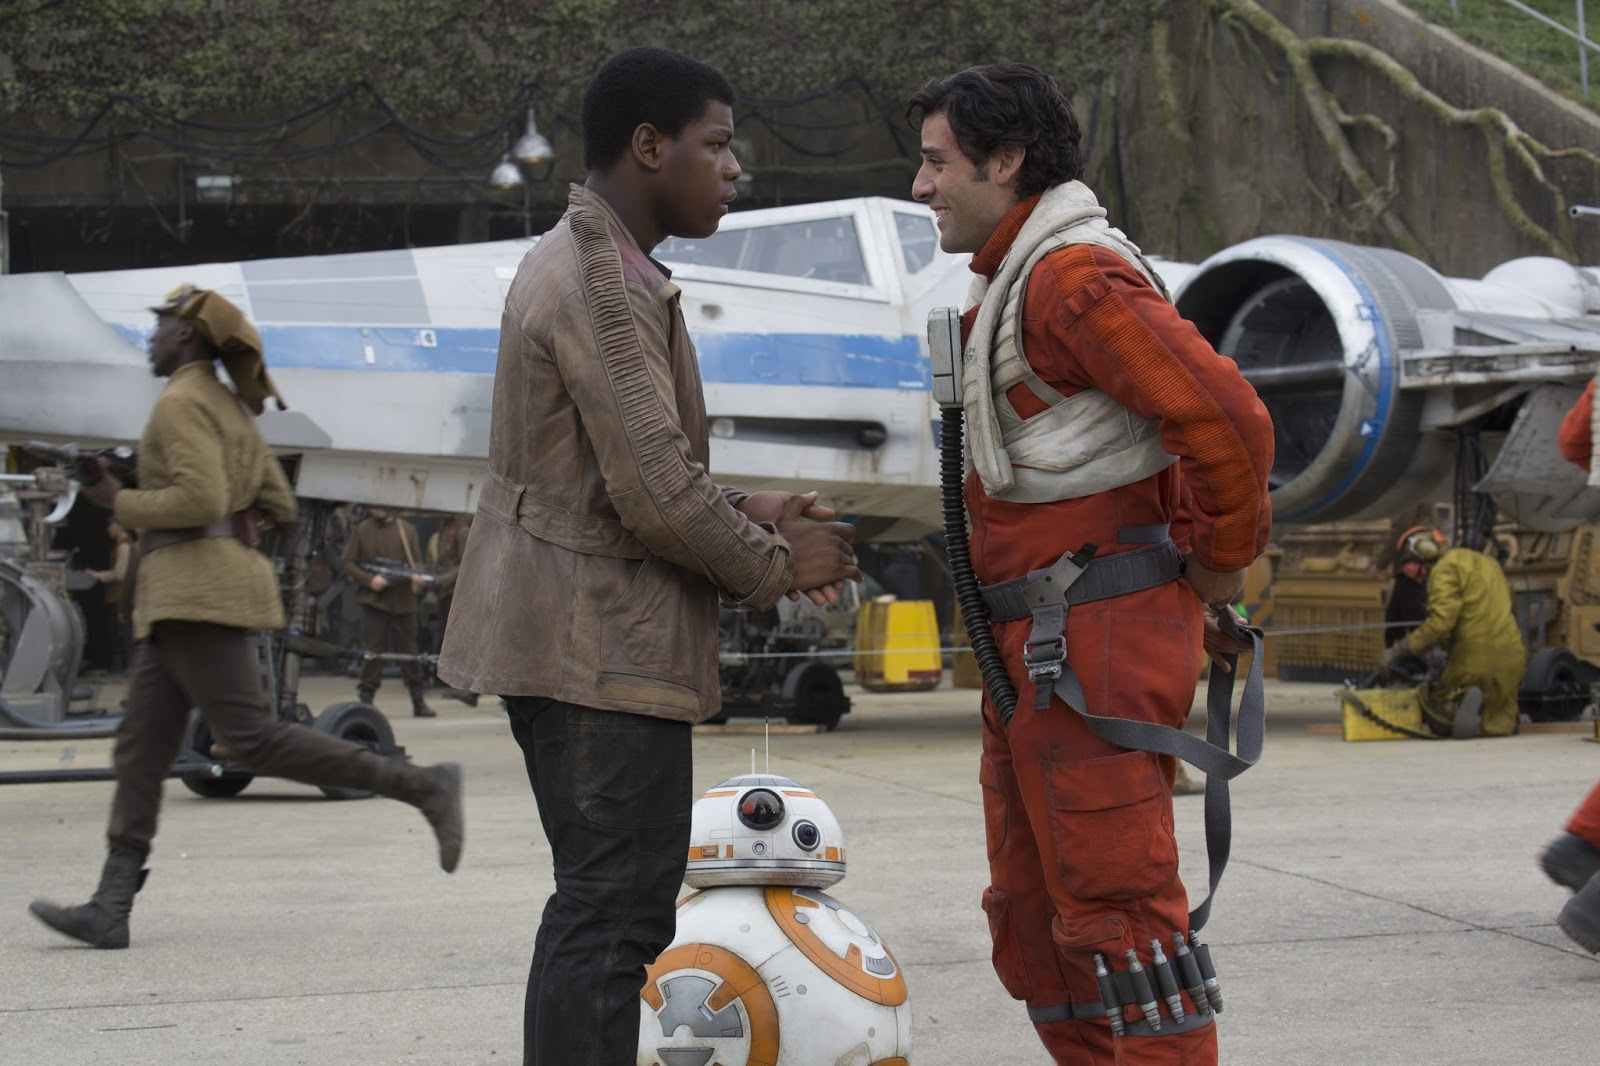 star wars the force awakens wallpaper